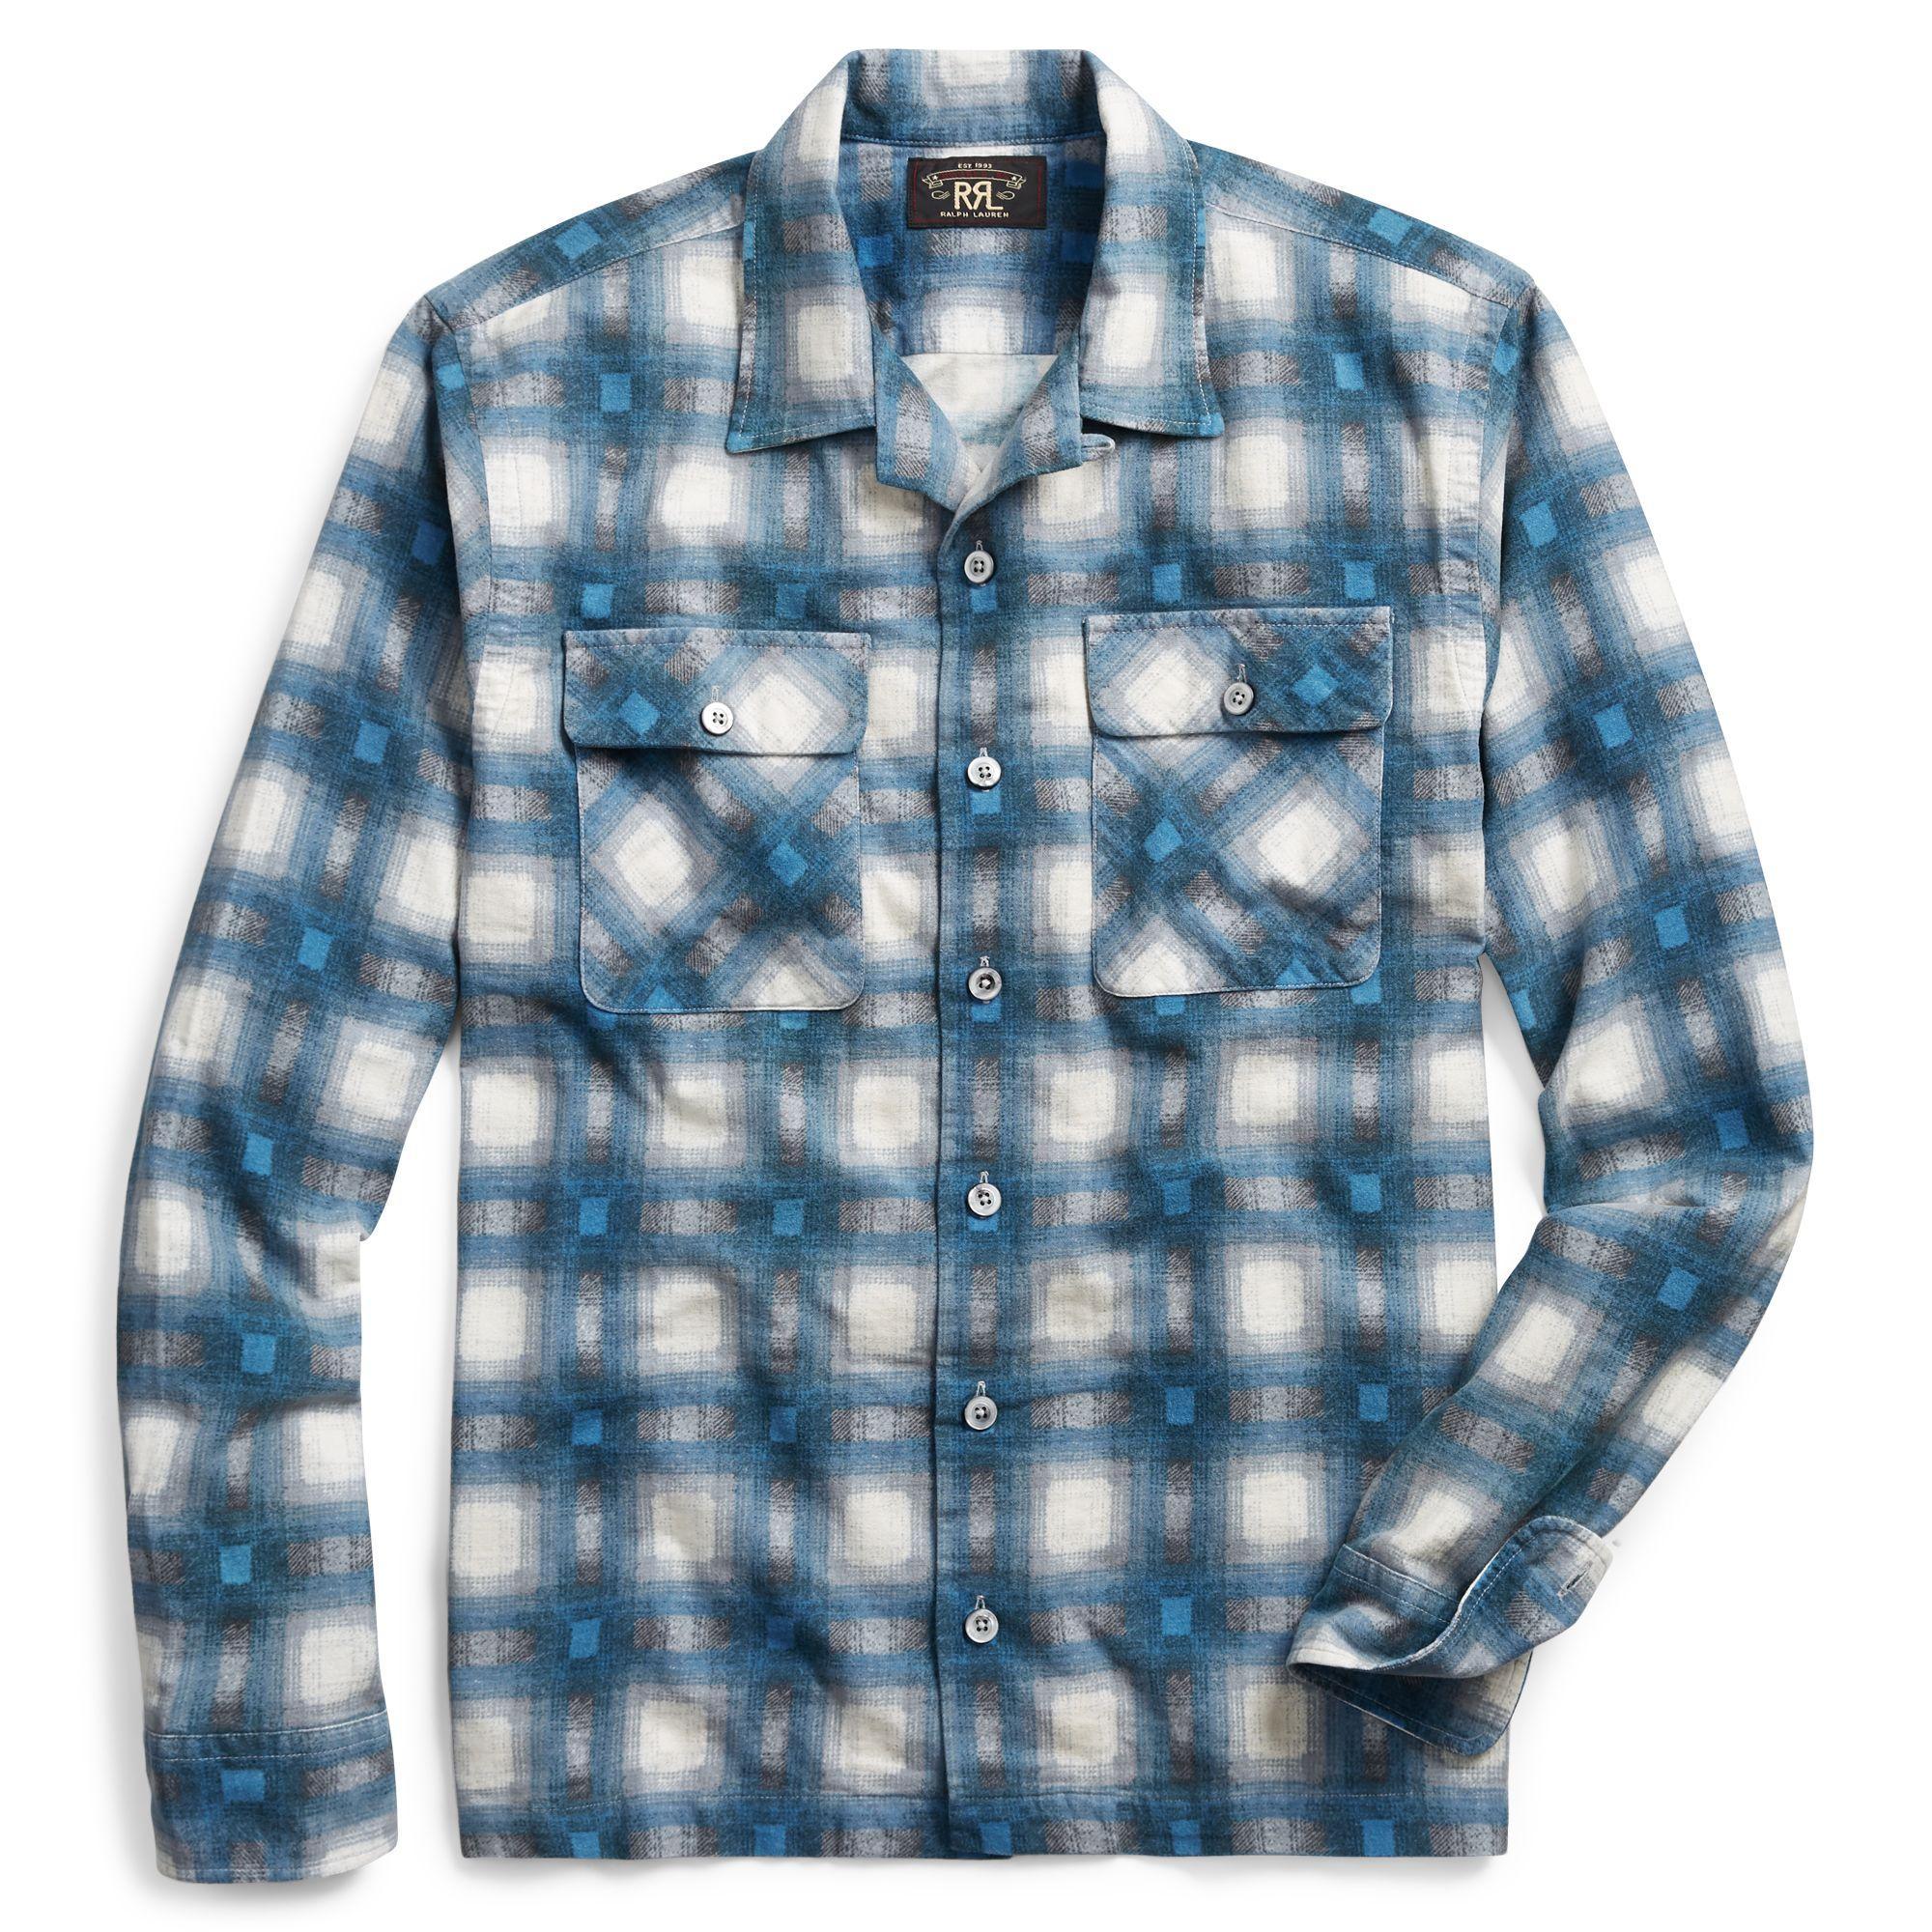 5dfe0dc3 RRL Brooks Camp Shirt - Blue/cream in Blue for Men - Lyst